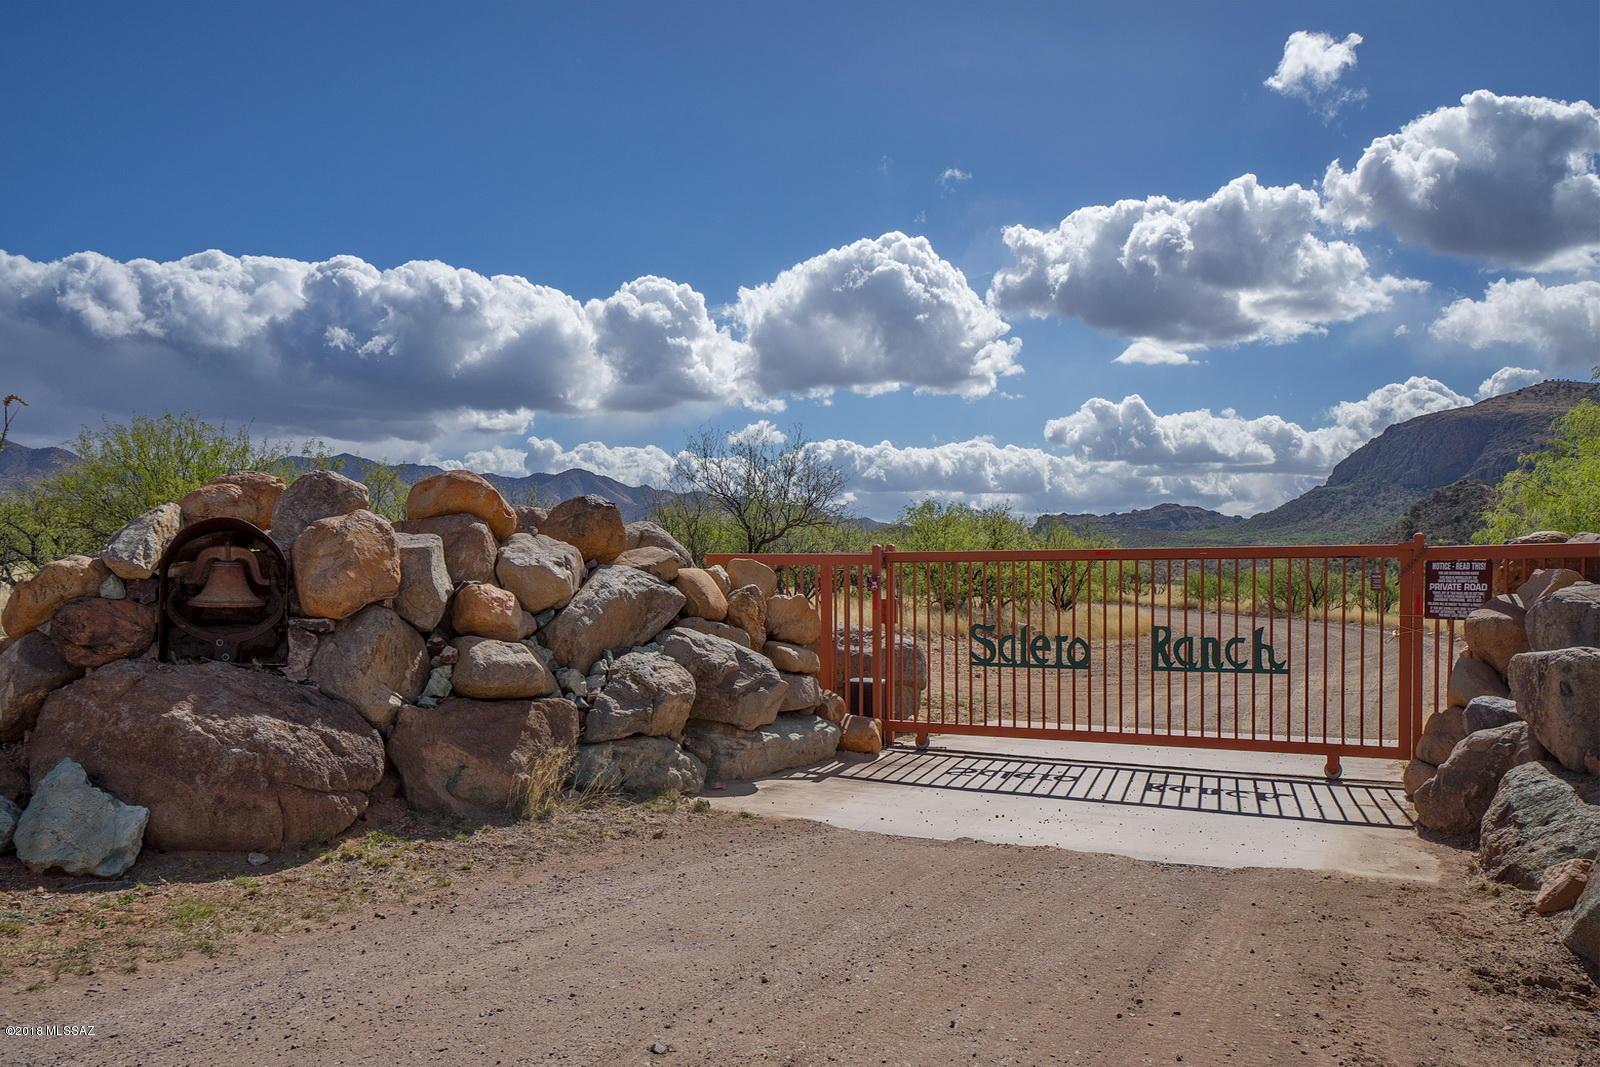 Unit 116, Tbd Salero Mountain Drive, Tubac AZ 85646 - Photo 2